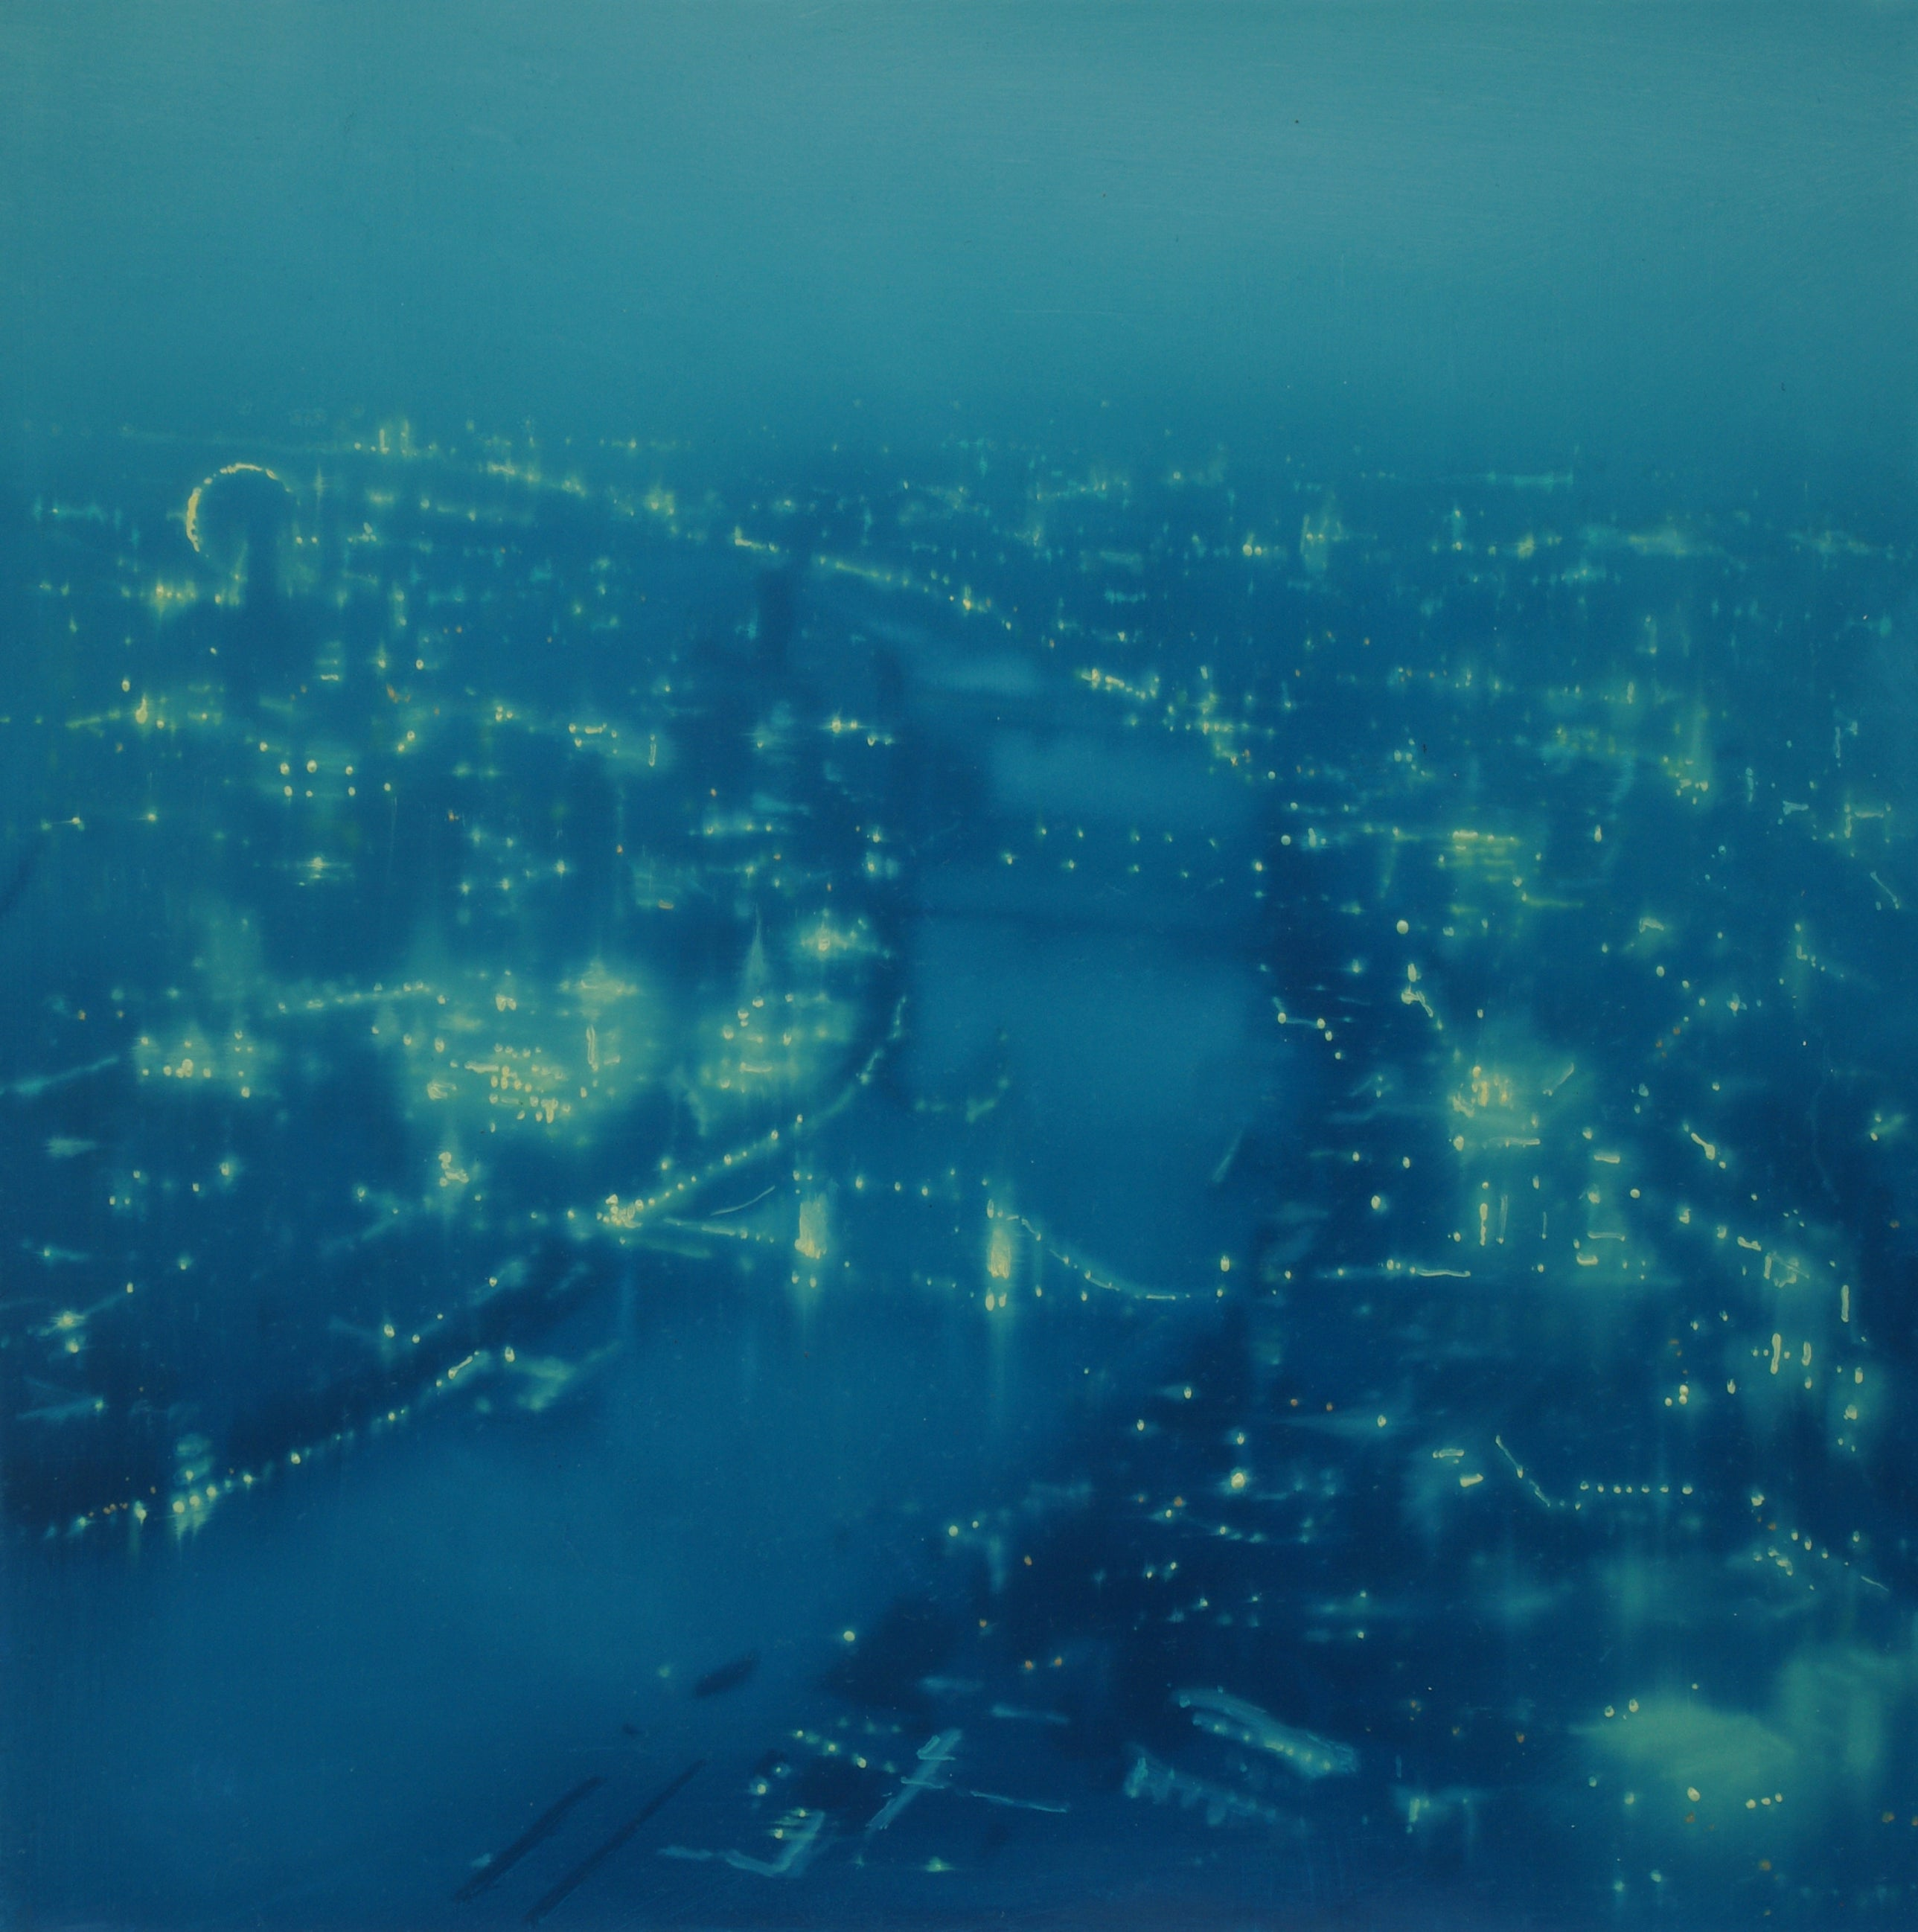 Blue Thames Bridges (London) Jenny Pockley Oil painting/study.